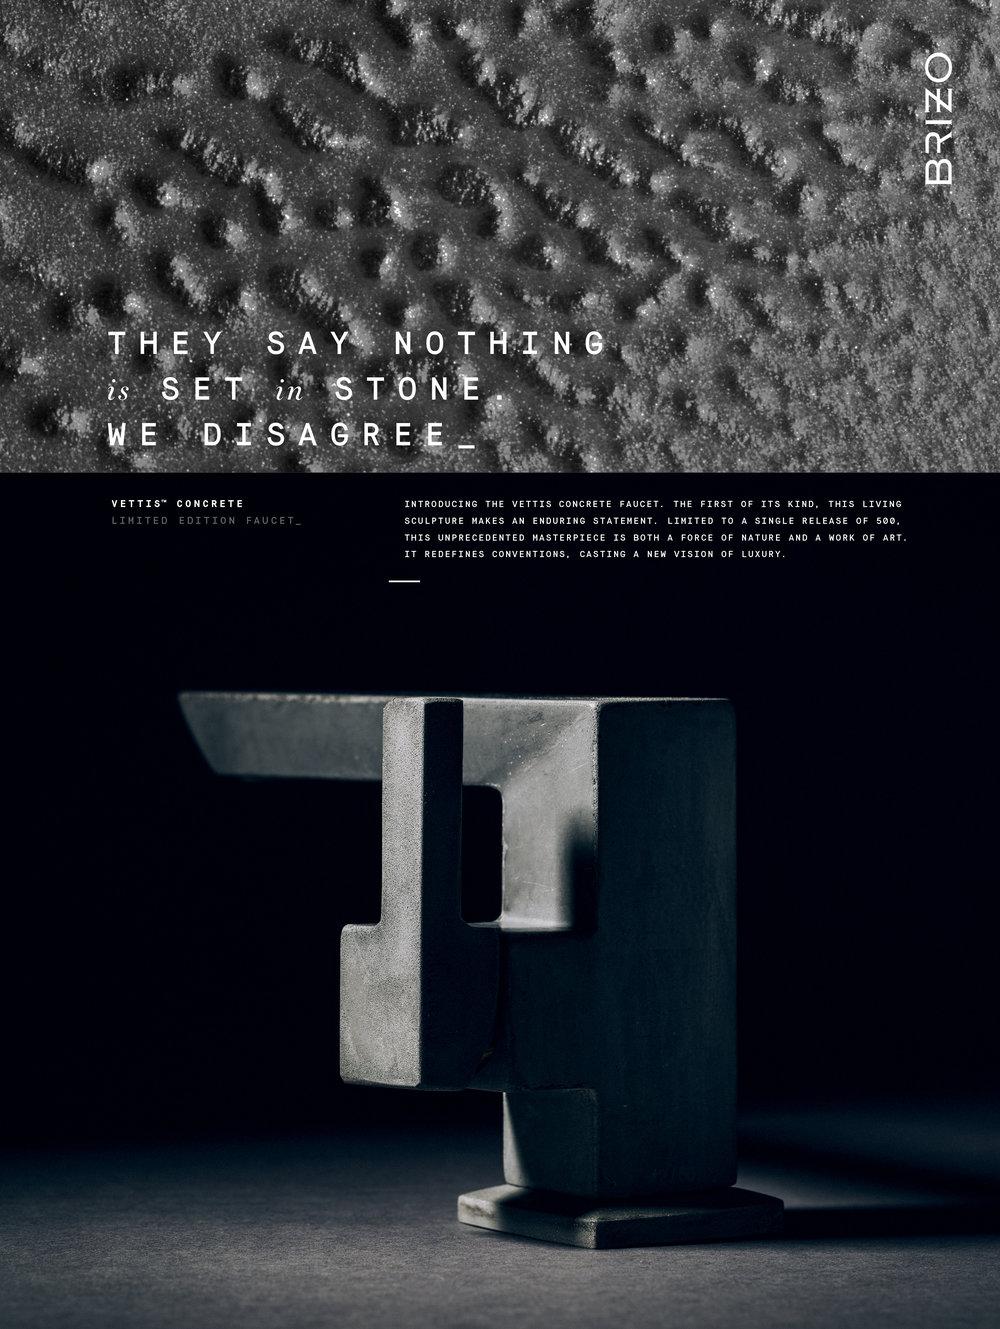 18-BR Concrete_Event_Posters_18x24_23.jpg